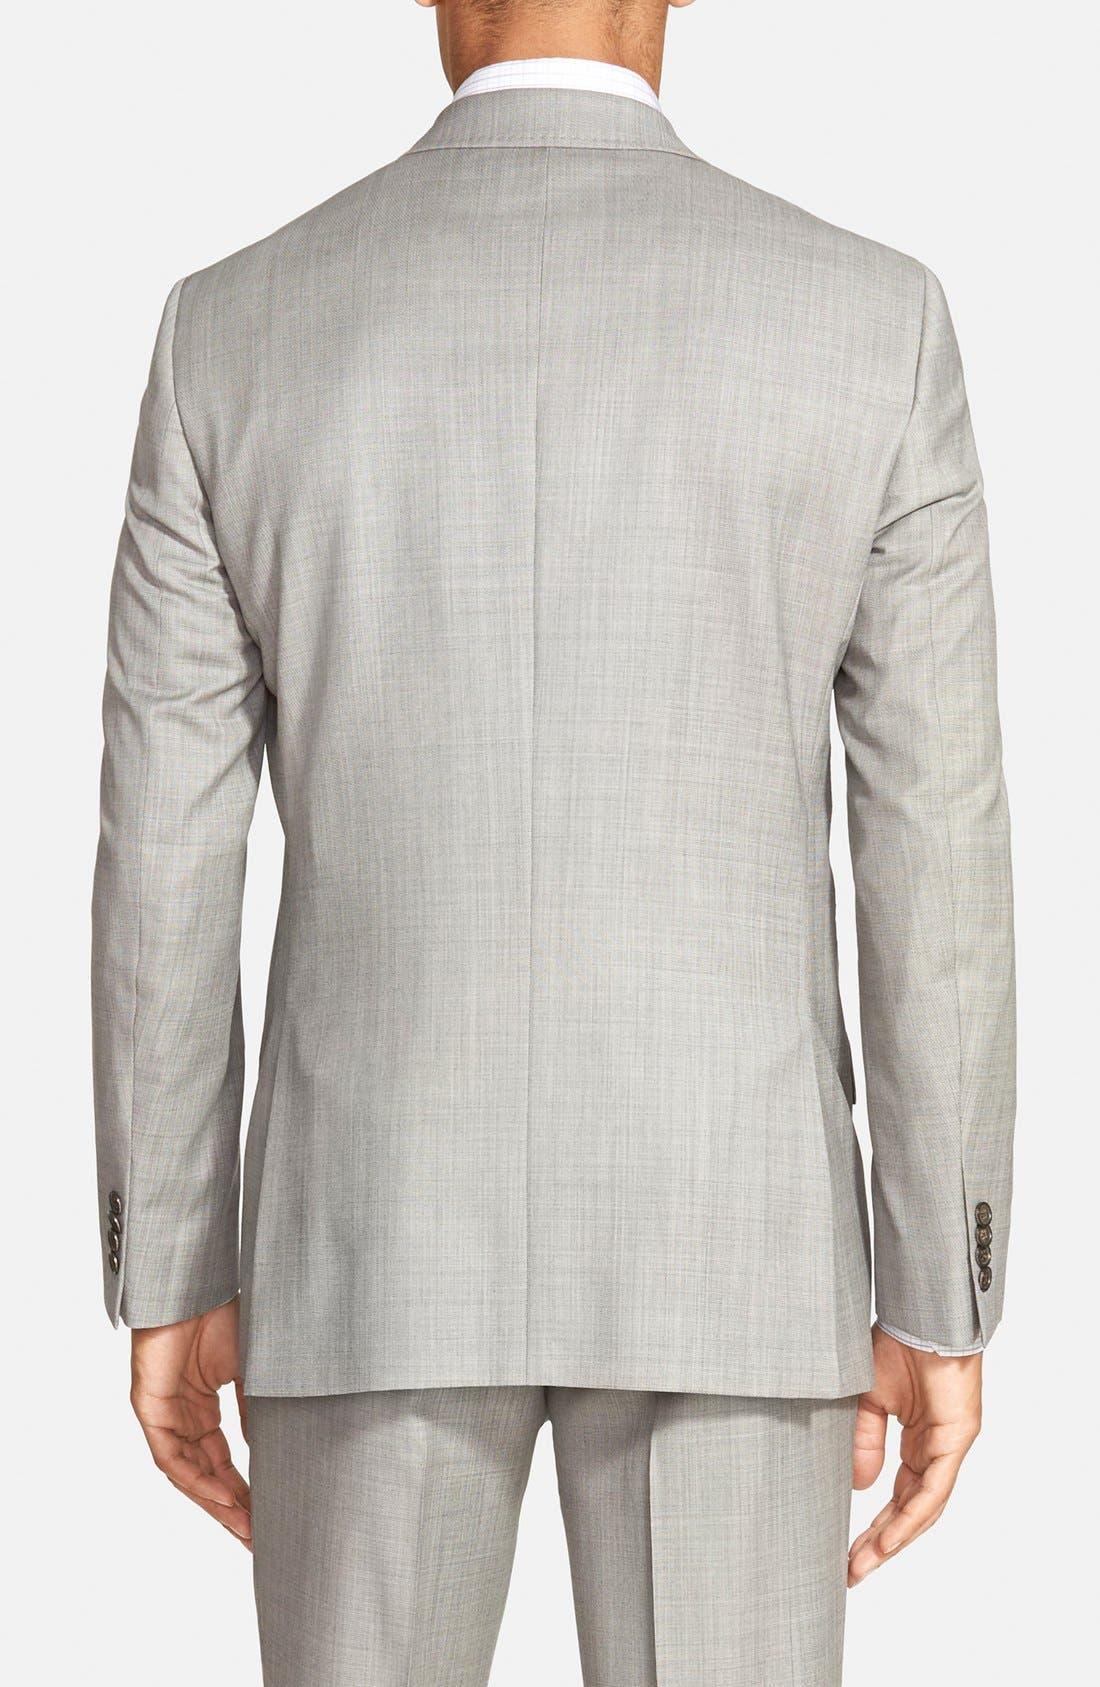 Jones Trim Fit Wool Suit,                             Alternate thumbnail 5, color,                             Medium Grey